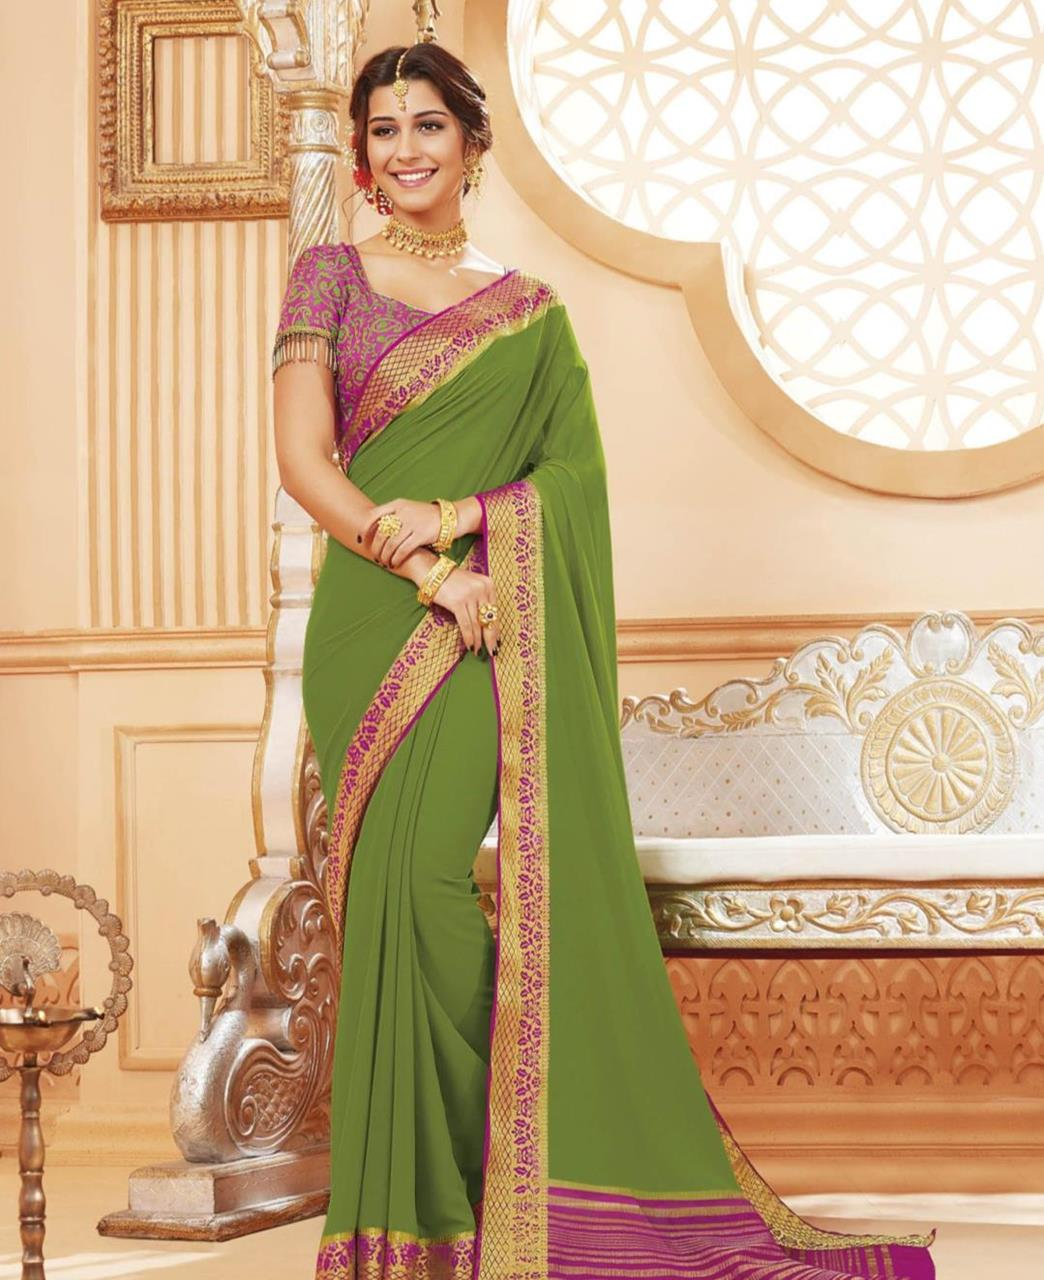 Lace Satin Saree in Green